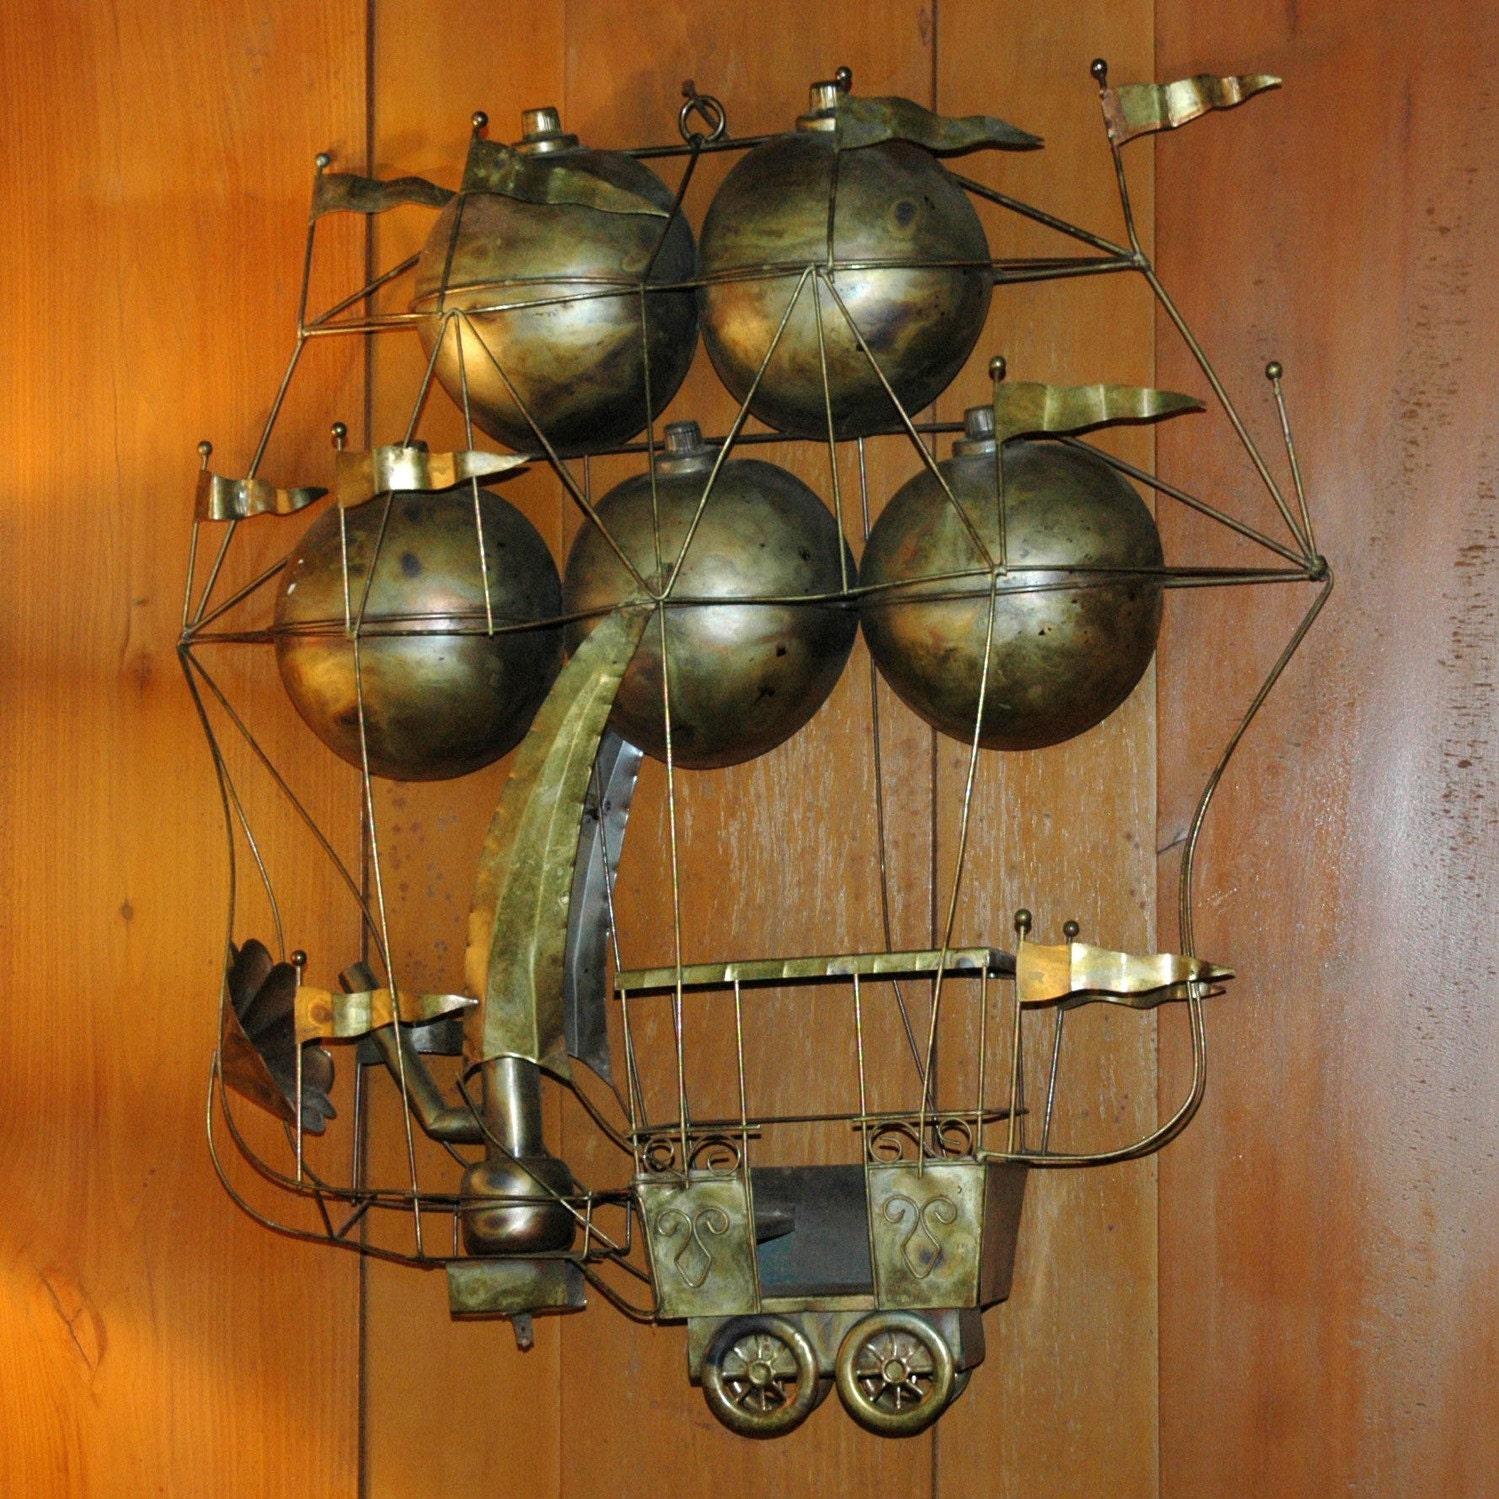 Brass Home Decor: Brass Steampunk Airship Steampunk Home Decor